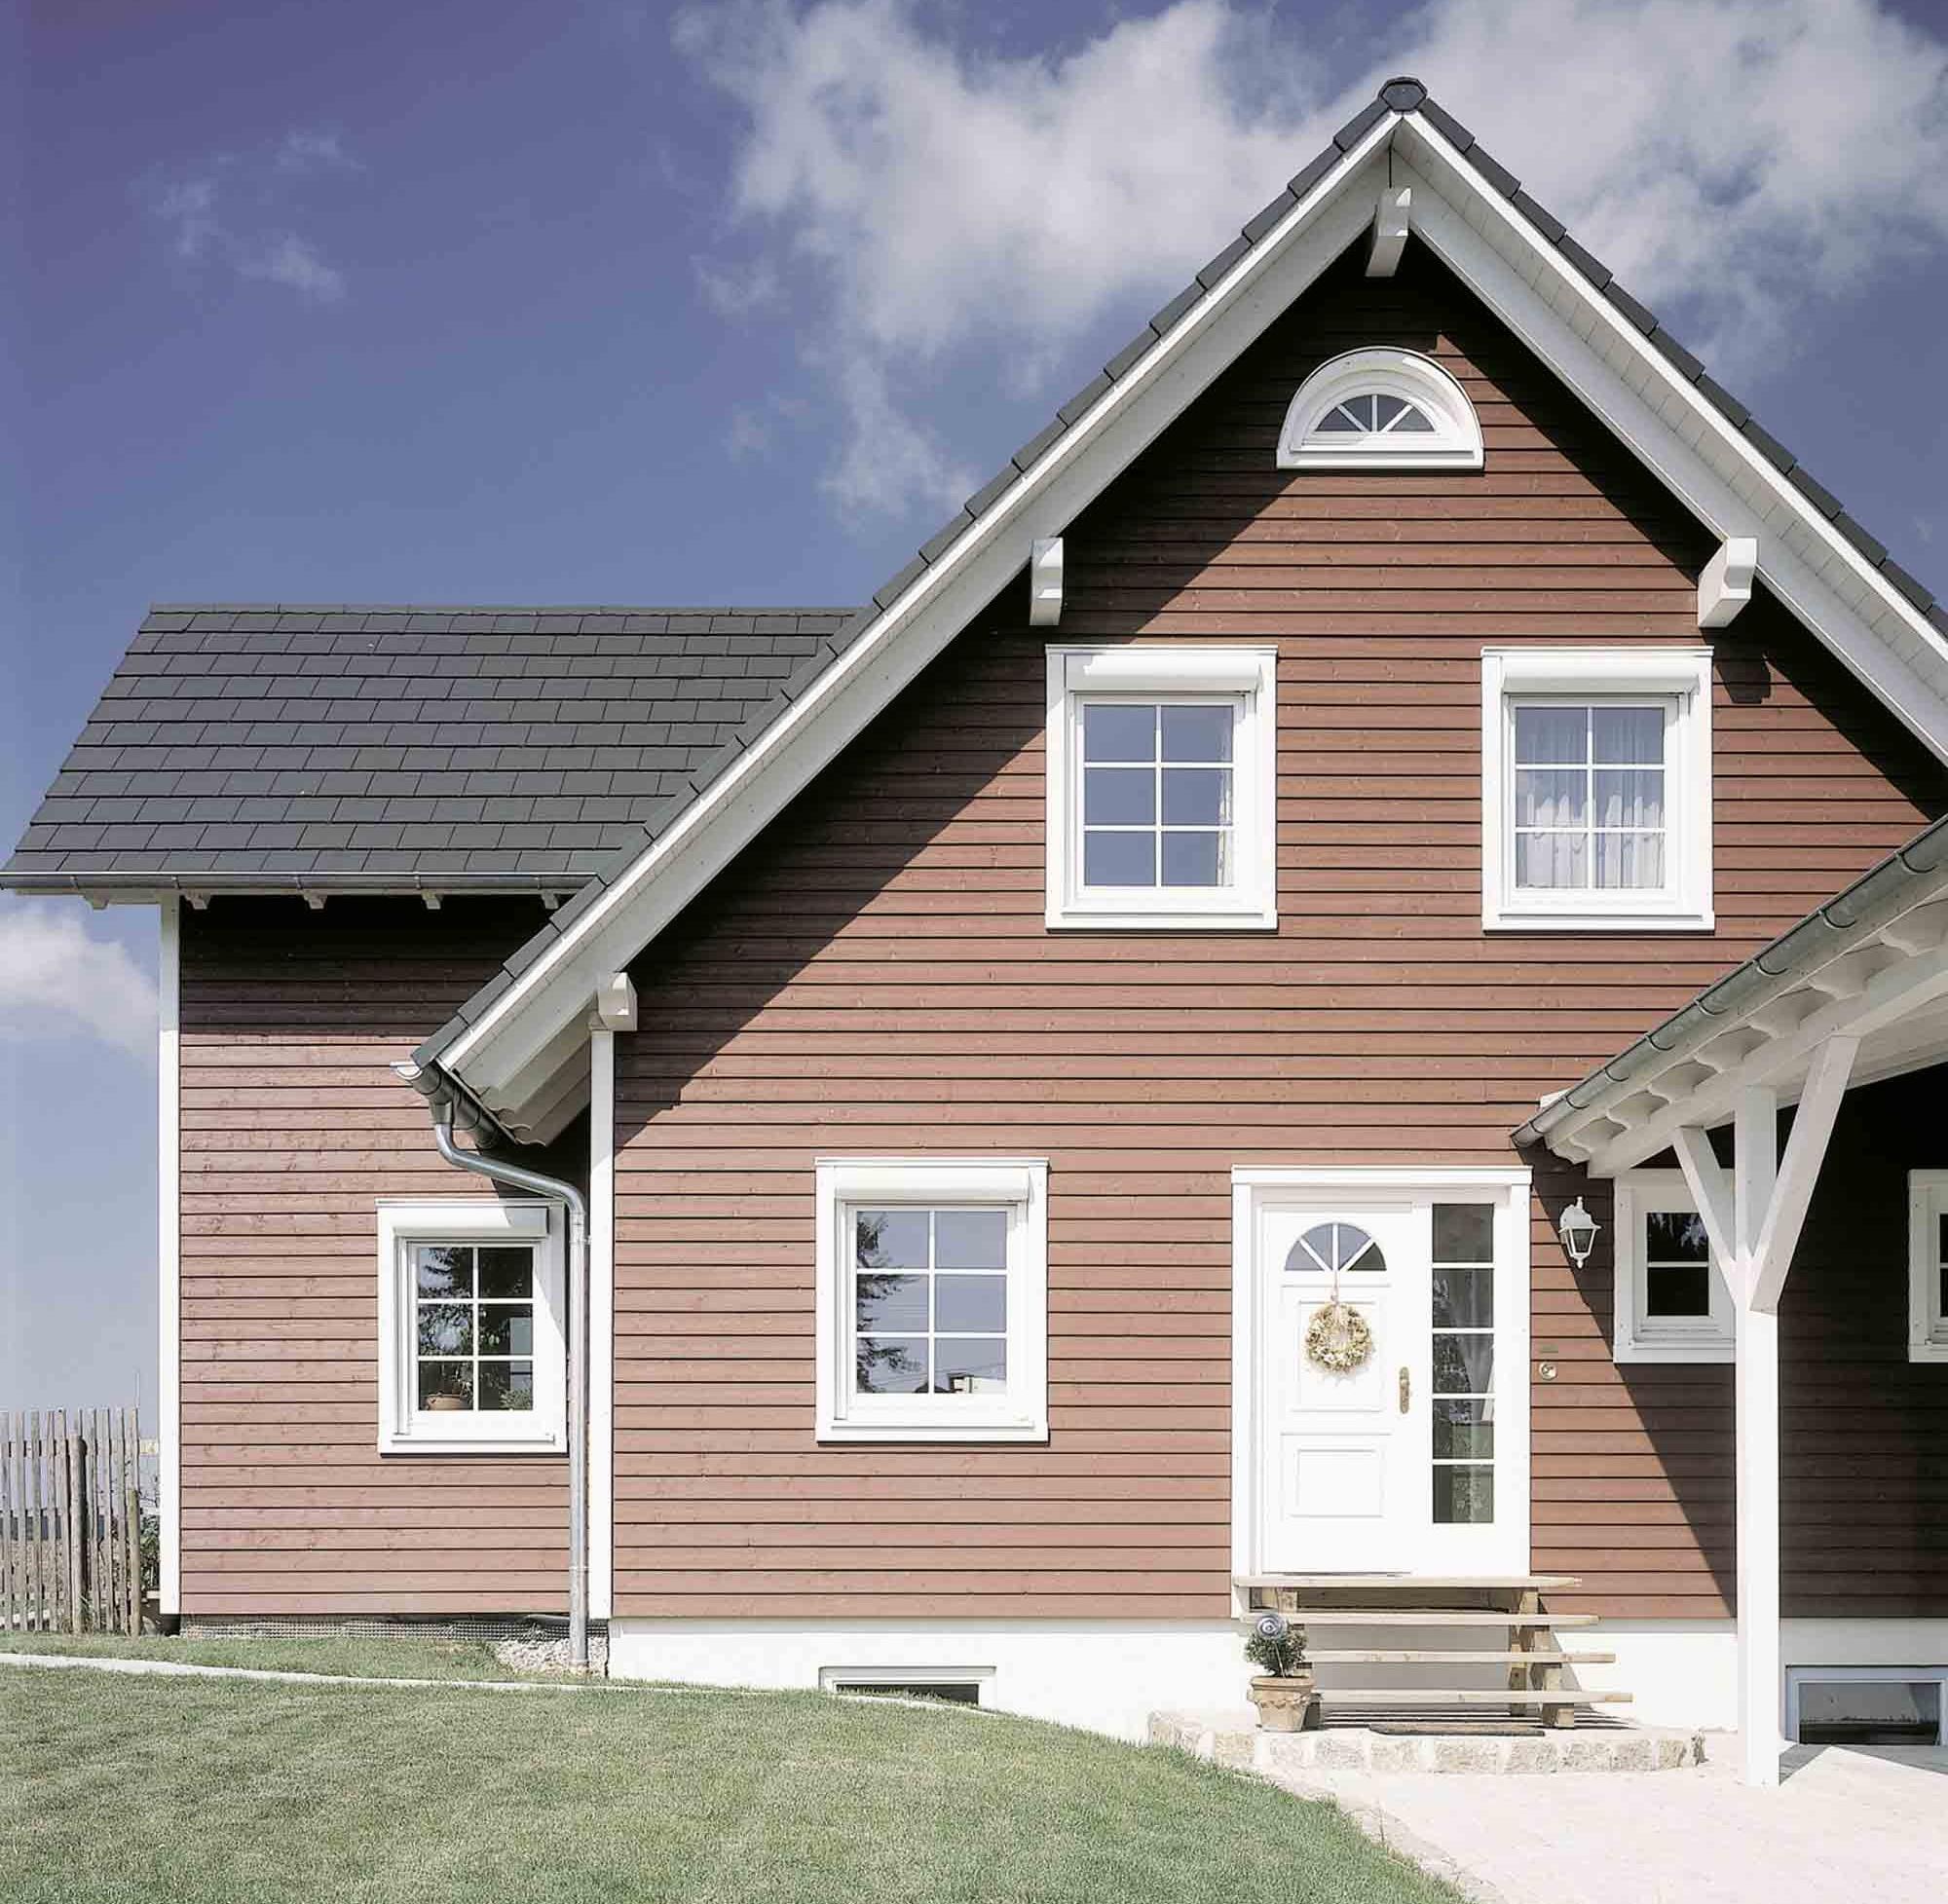 Holzfassade Nordic Style – HolzLand Verbeek